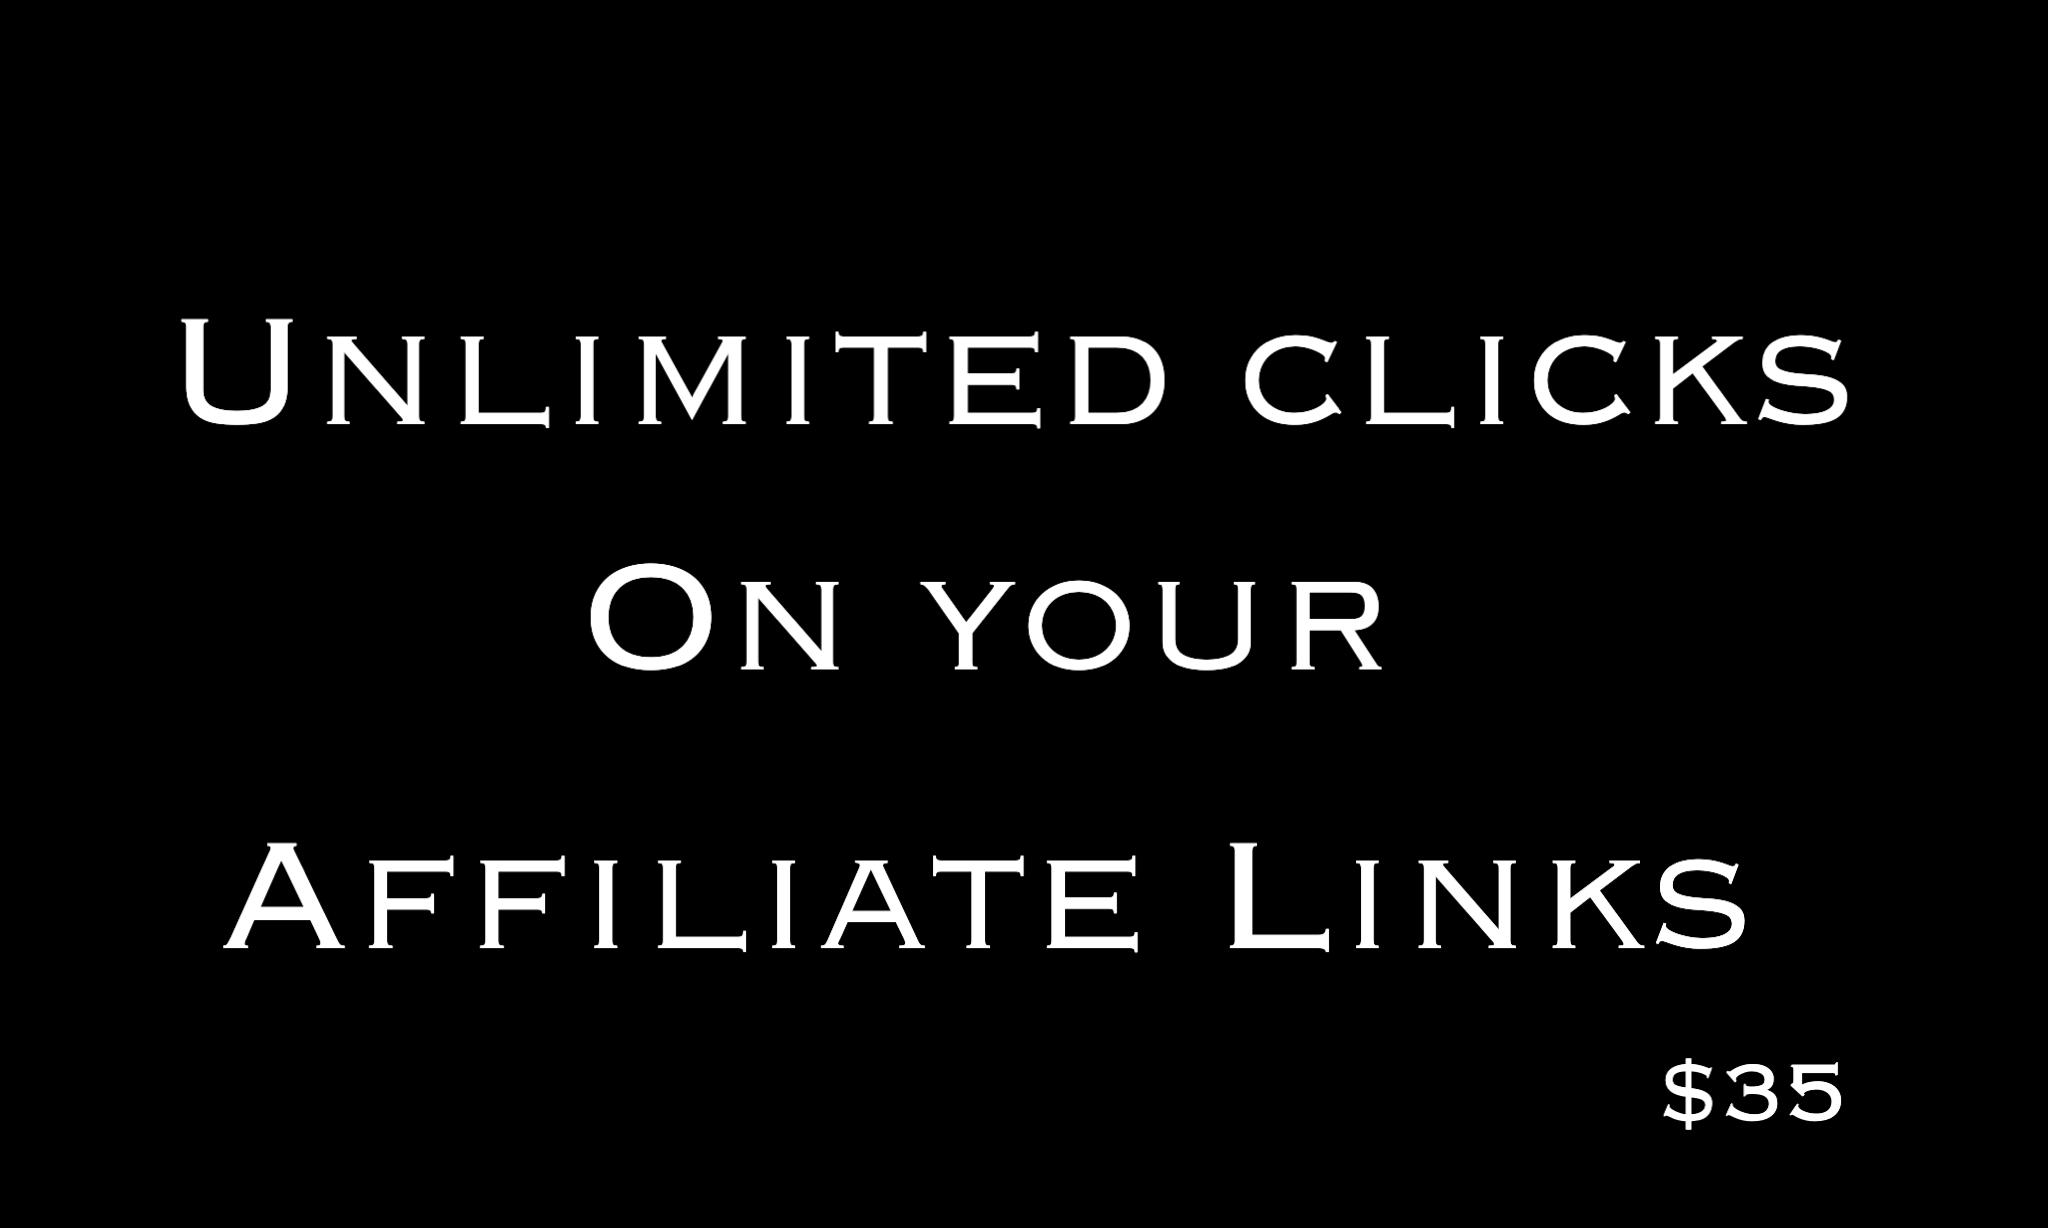 Get Unlimited Clicks On Affiliate Links